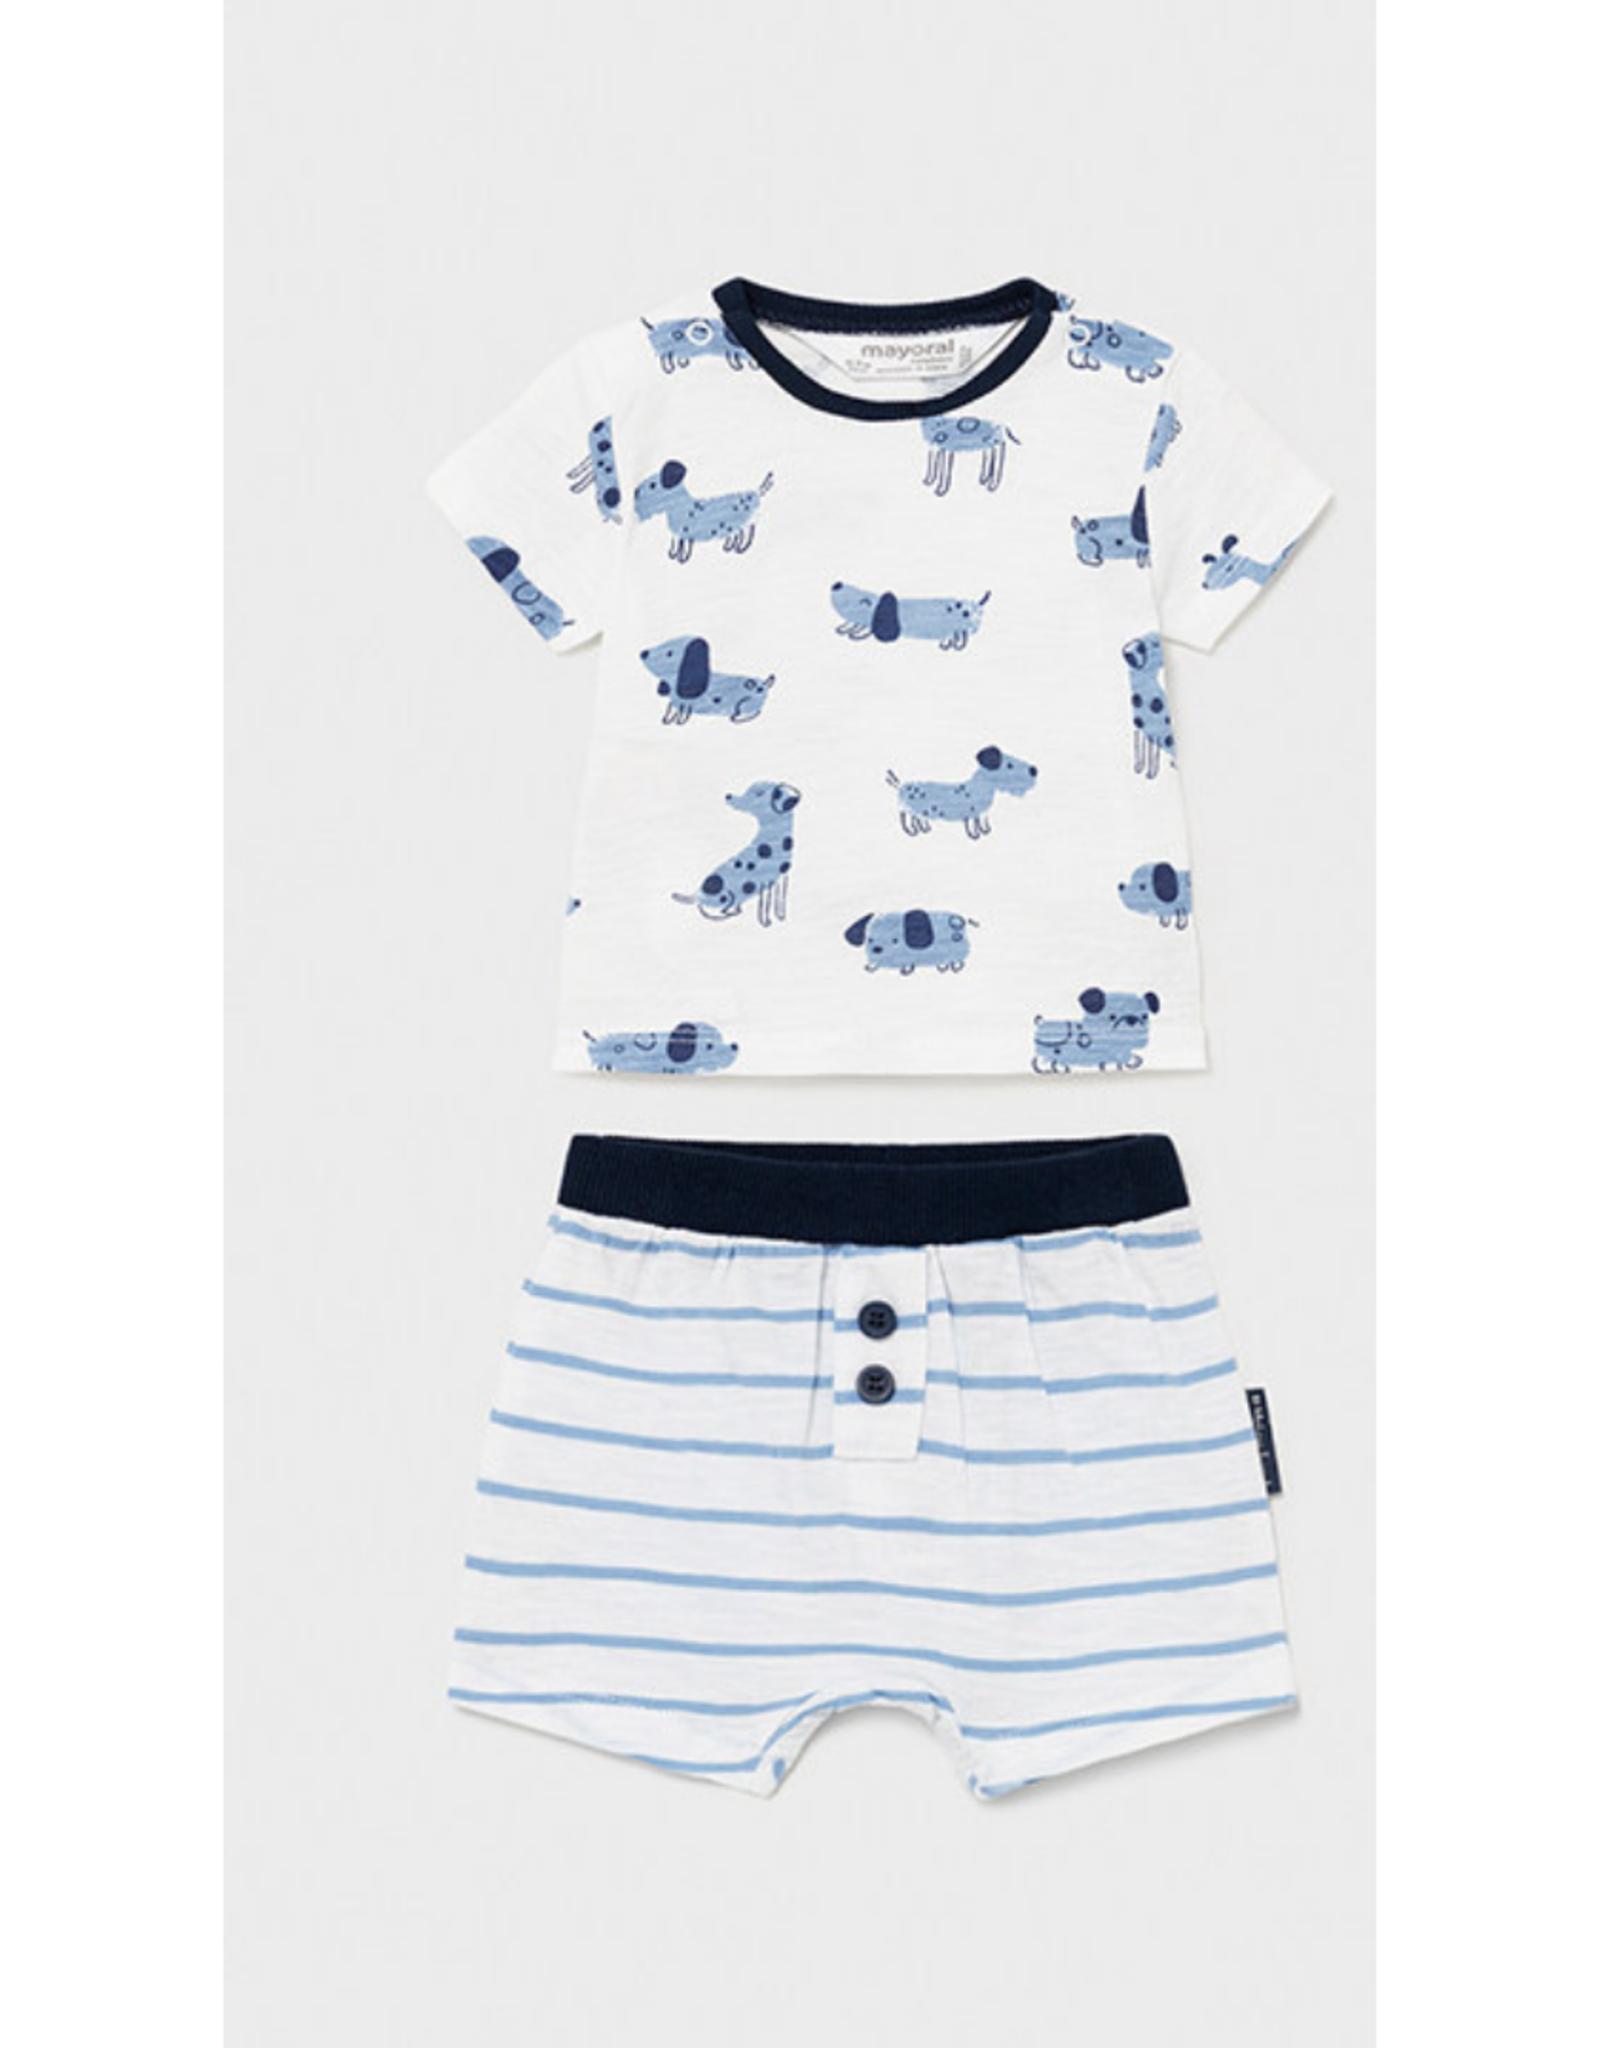 Mayoral Shirt & Shorts Set, Dogs Print Blue